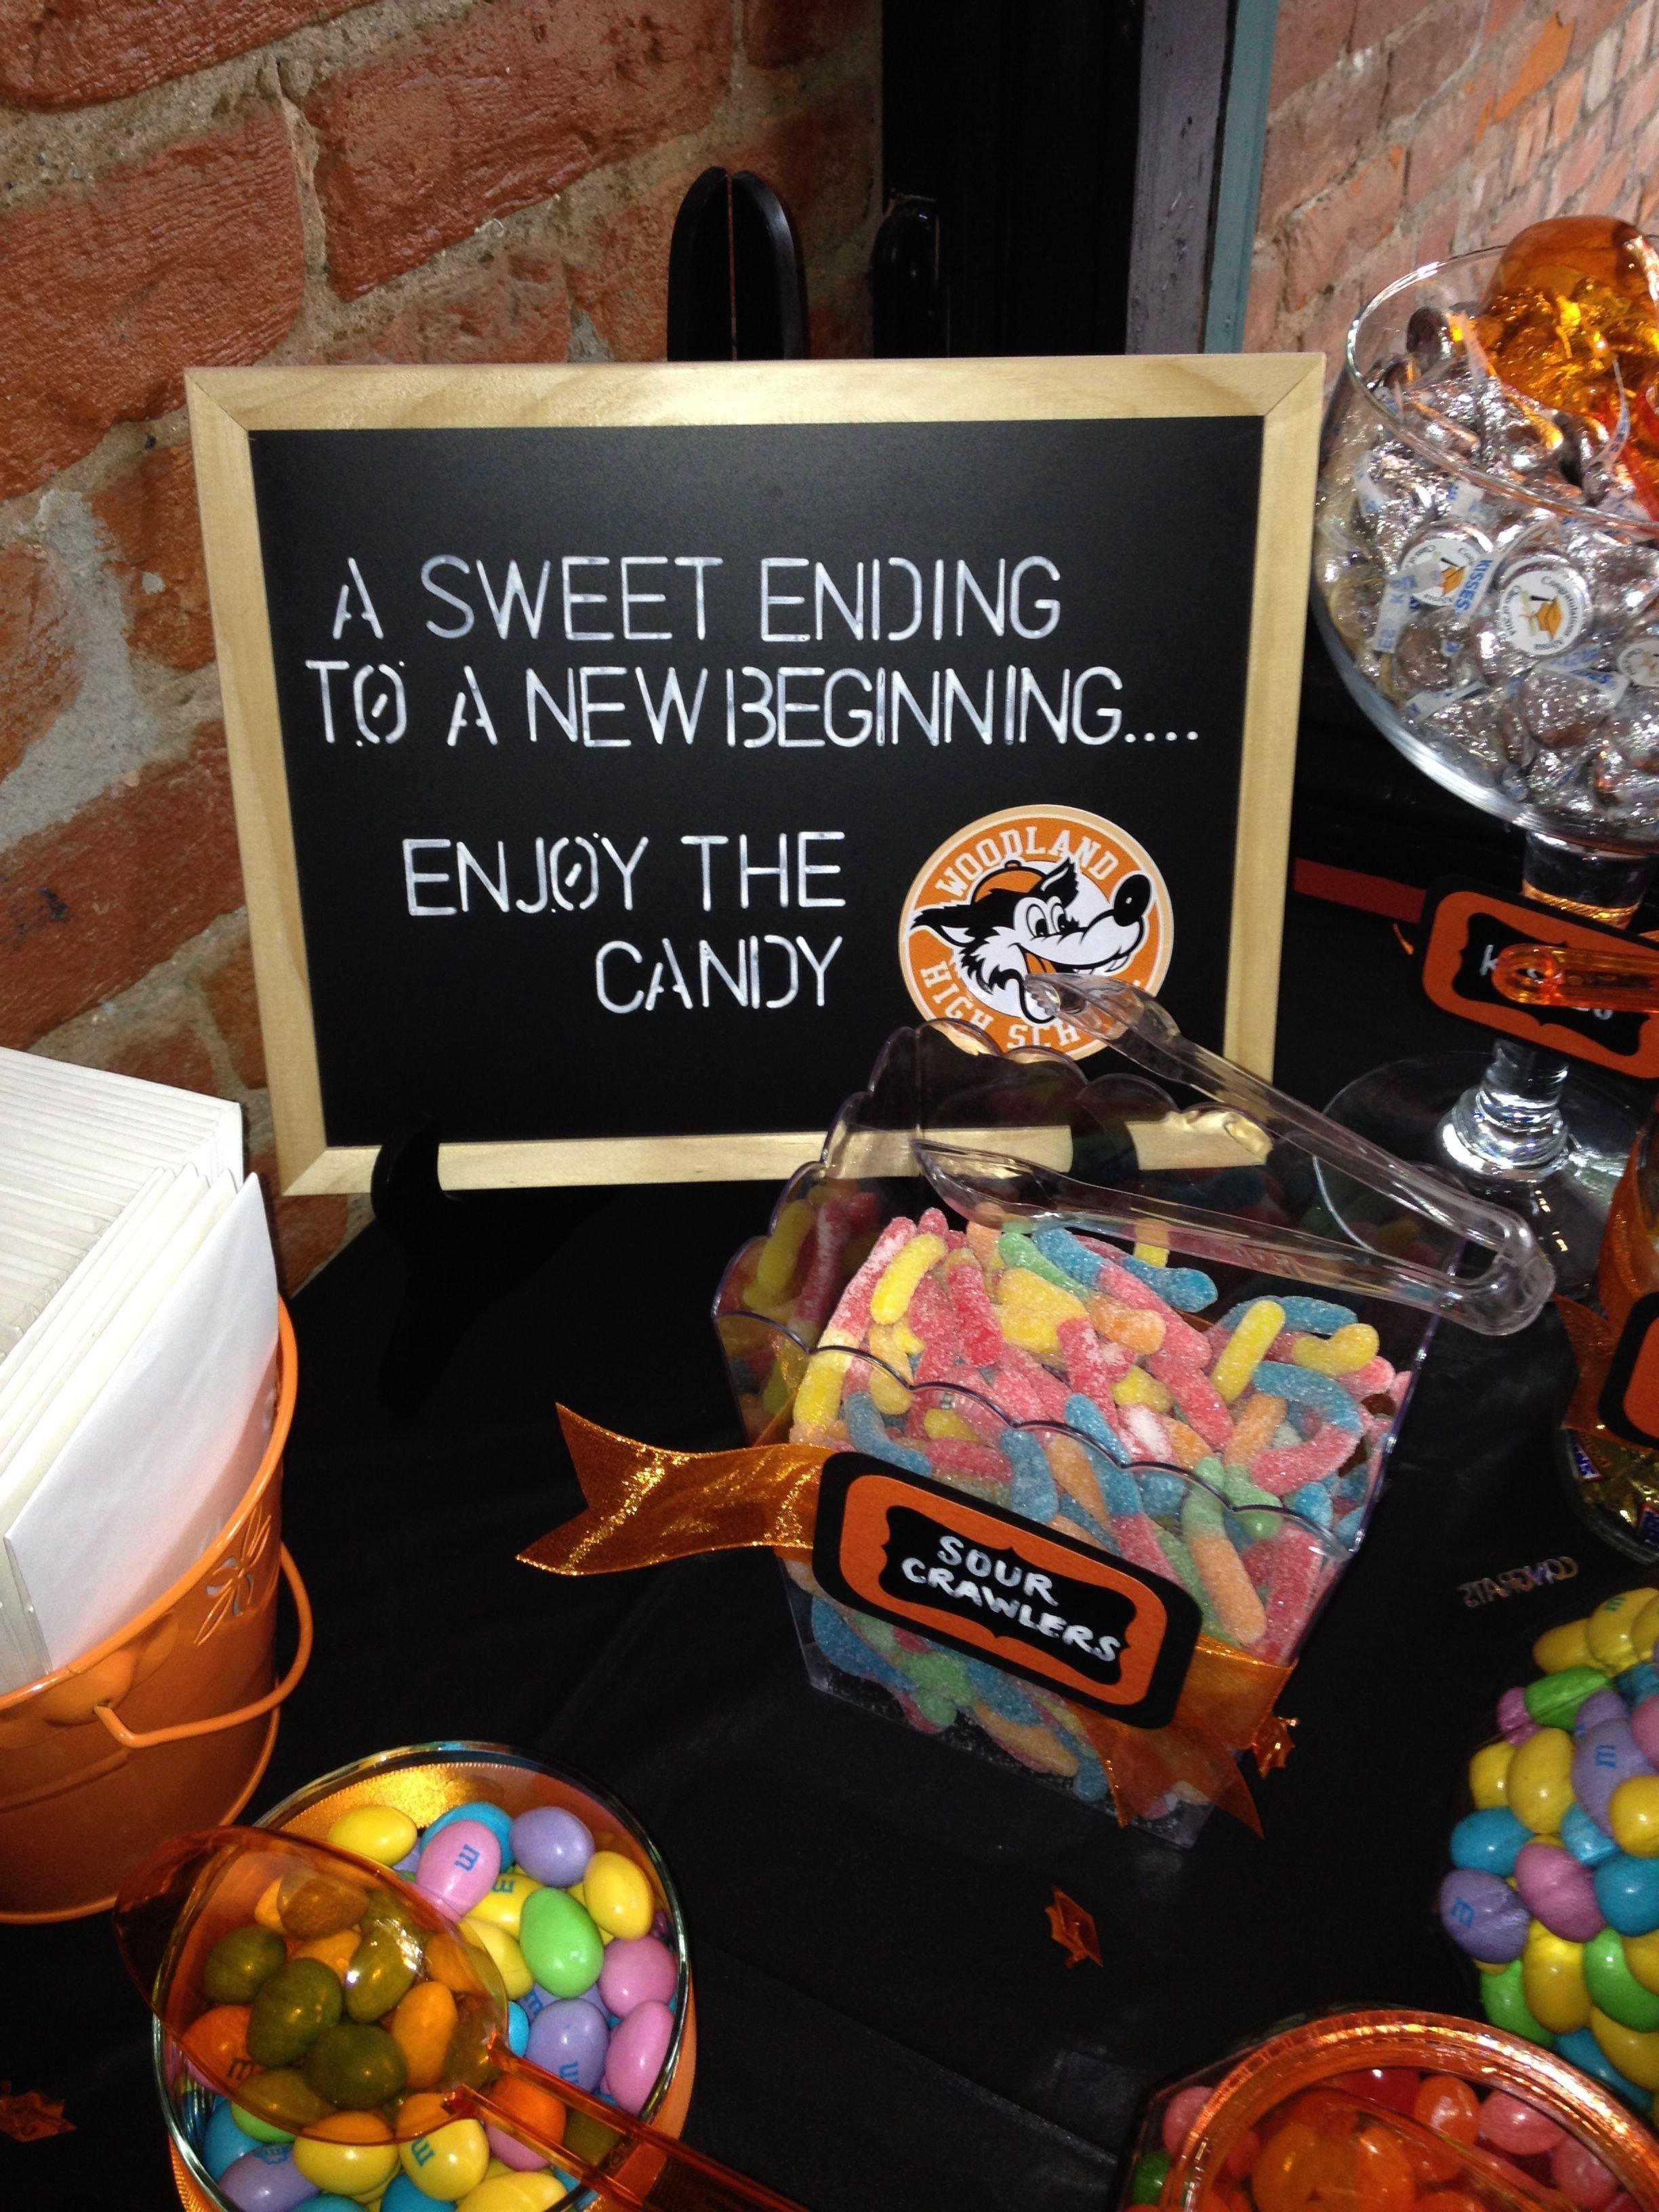 10 Great High School Graduation Party Ideas Pinterest graduation party ideas candy bar sign graduation decorations 2020